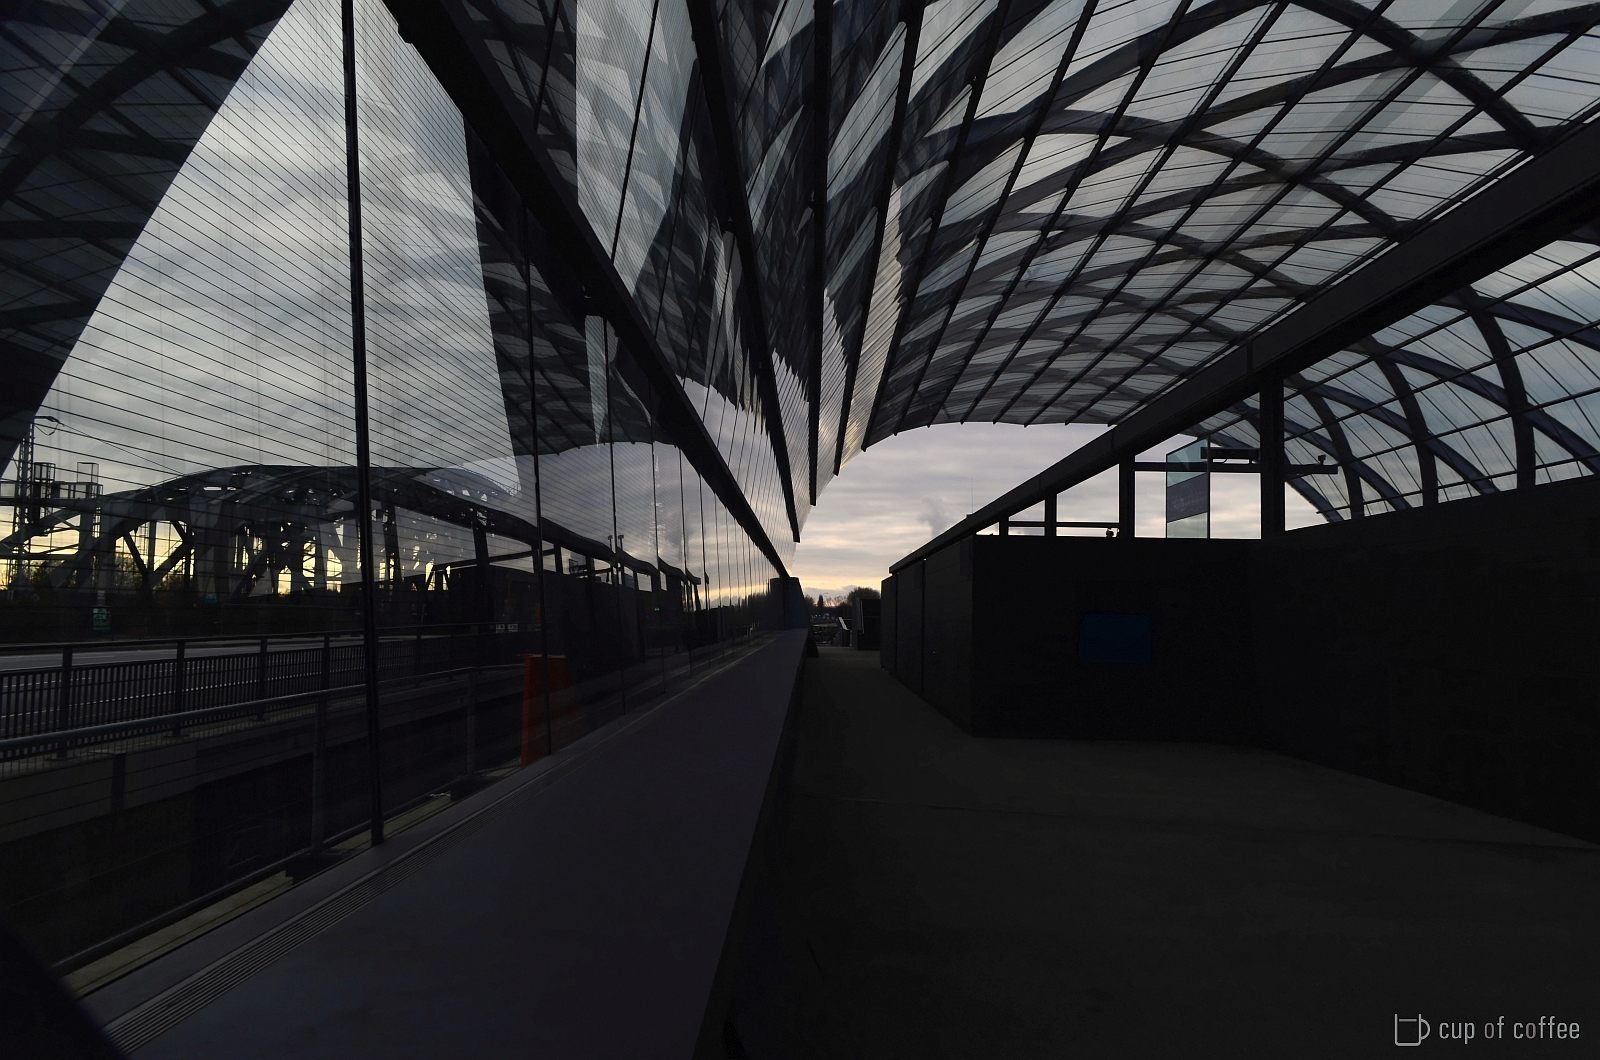 U4 Elbbrücken Hamburg